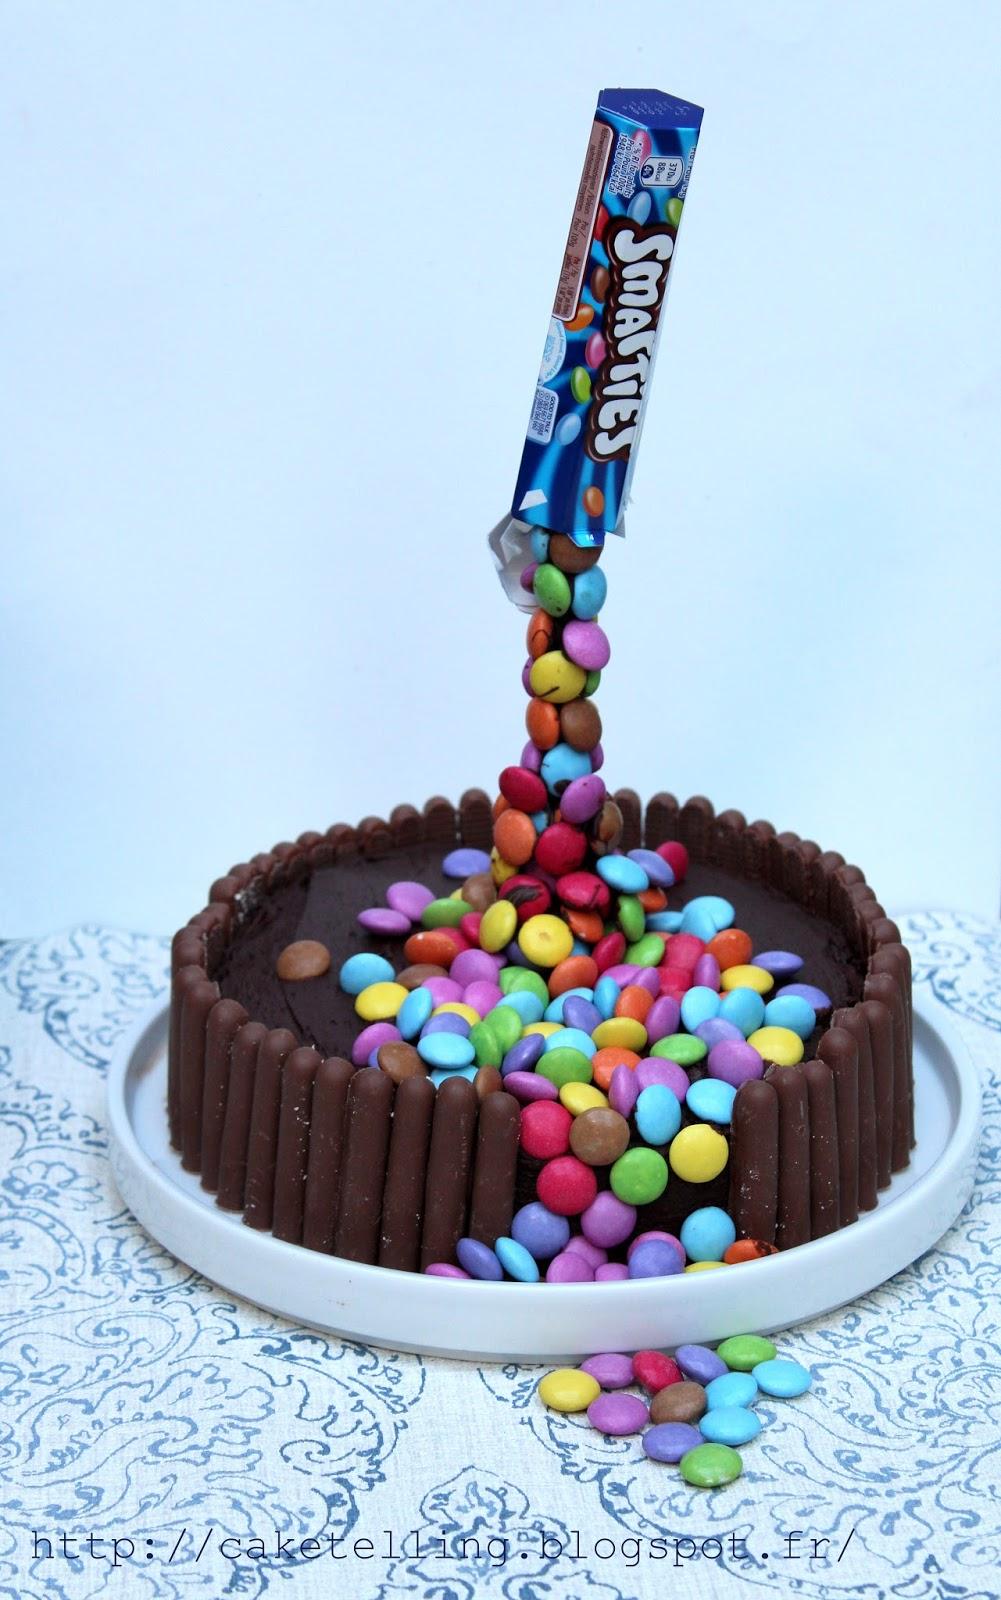 Caketelling le d fi du gravity cake - Gravity cake noel ...